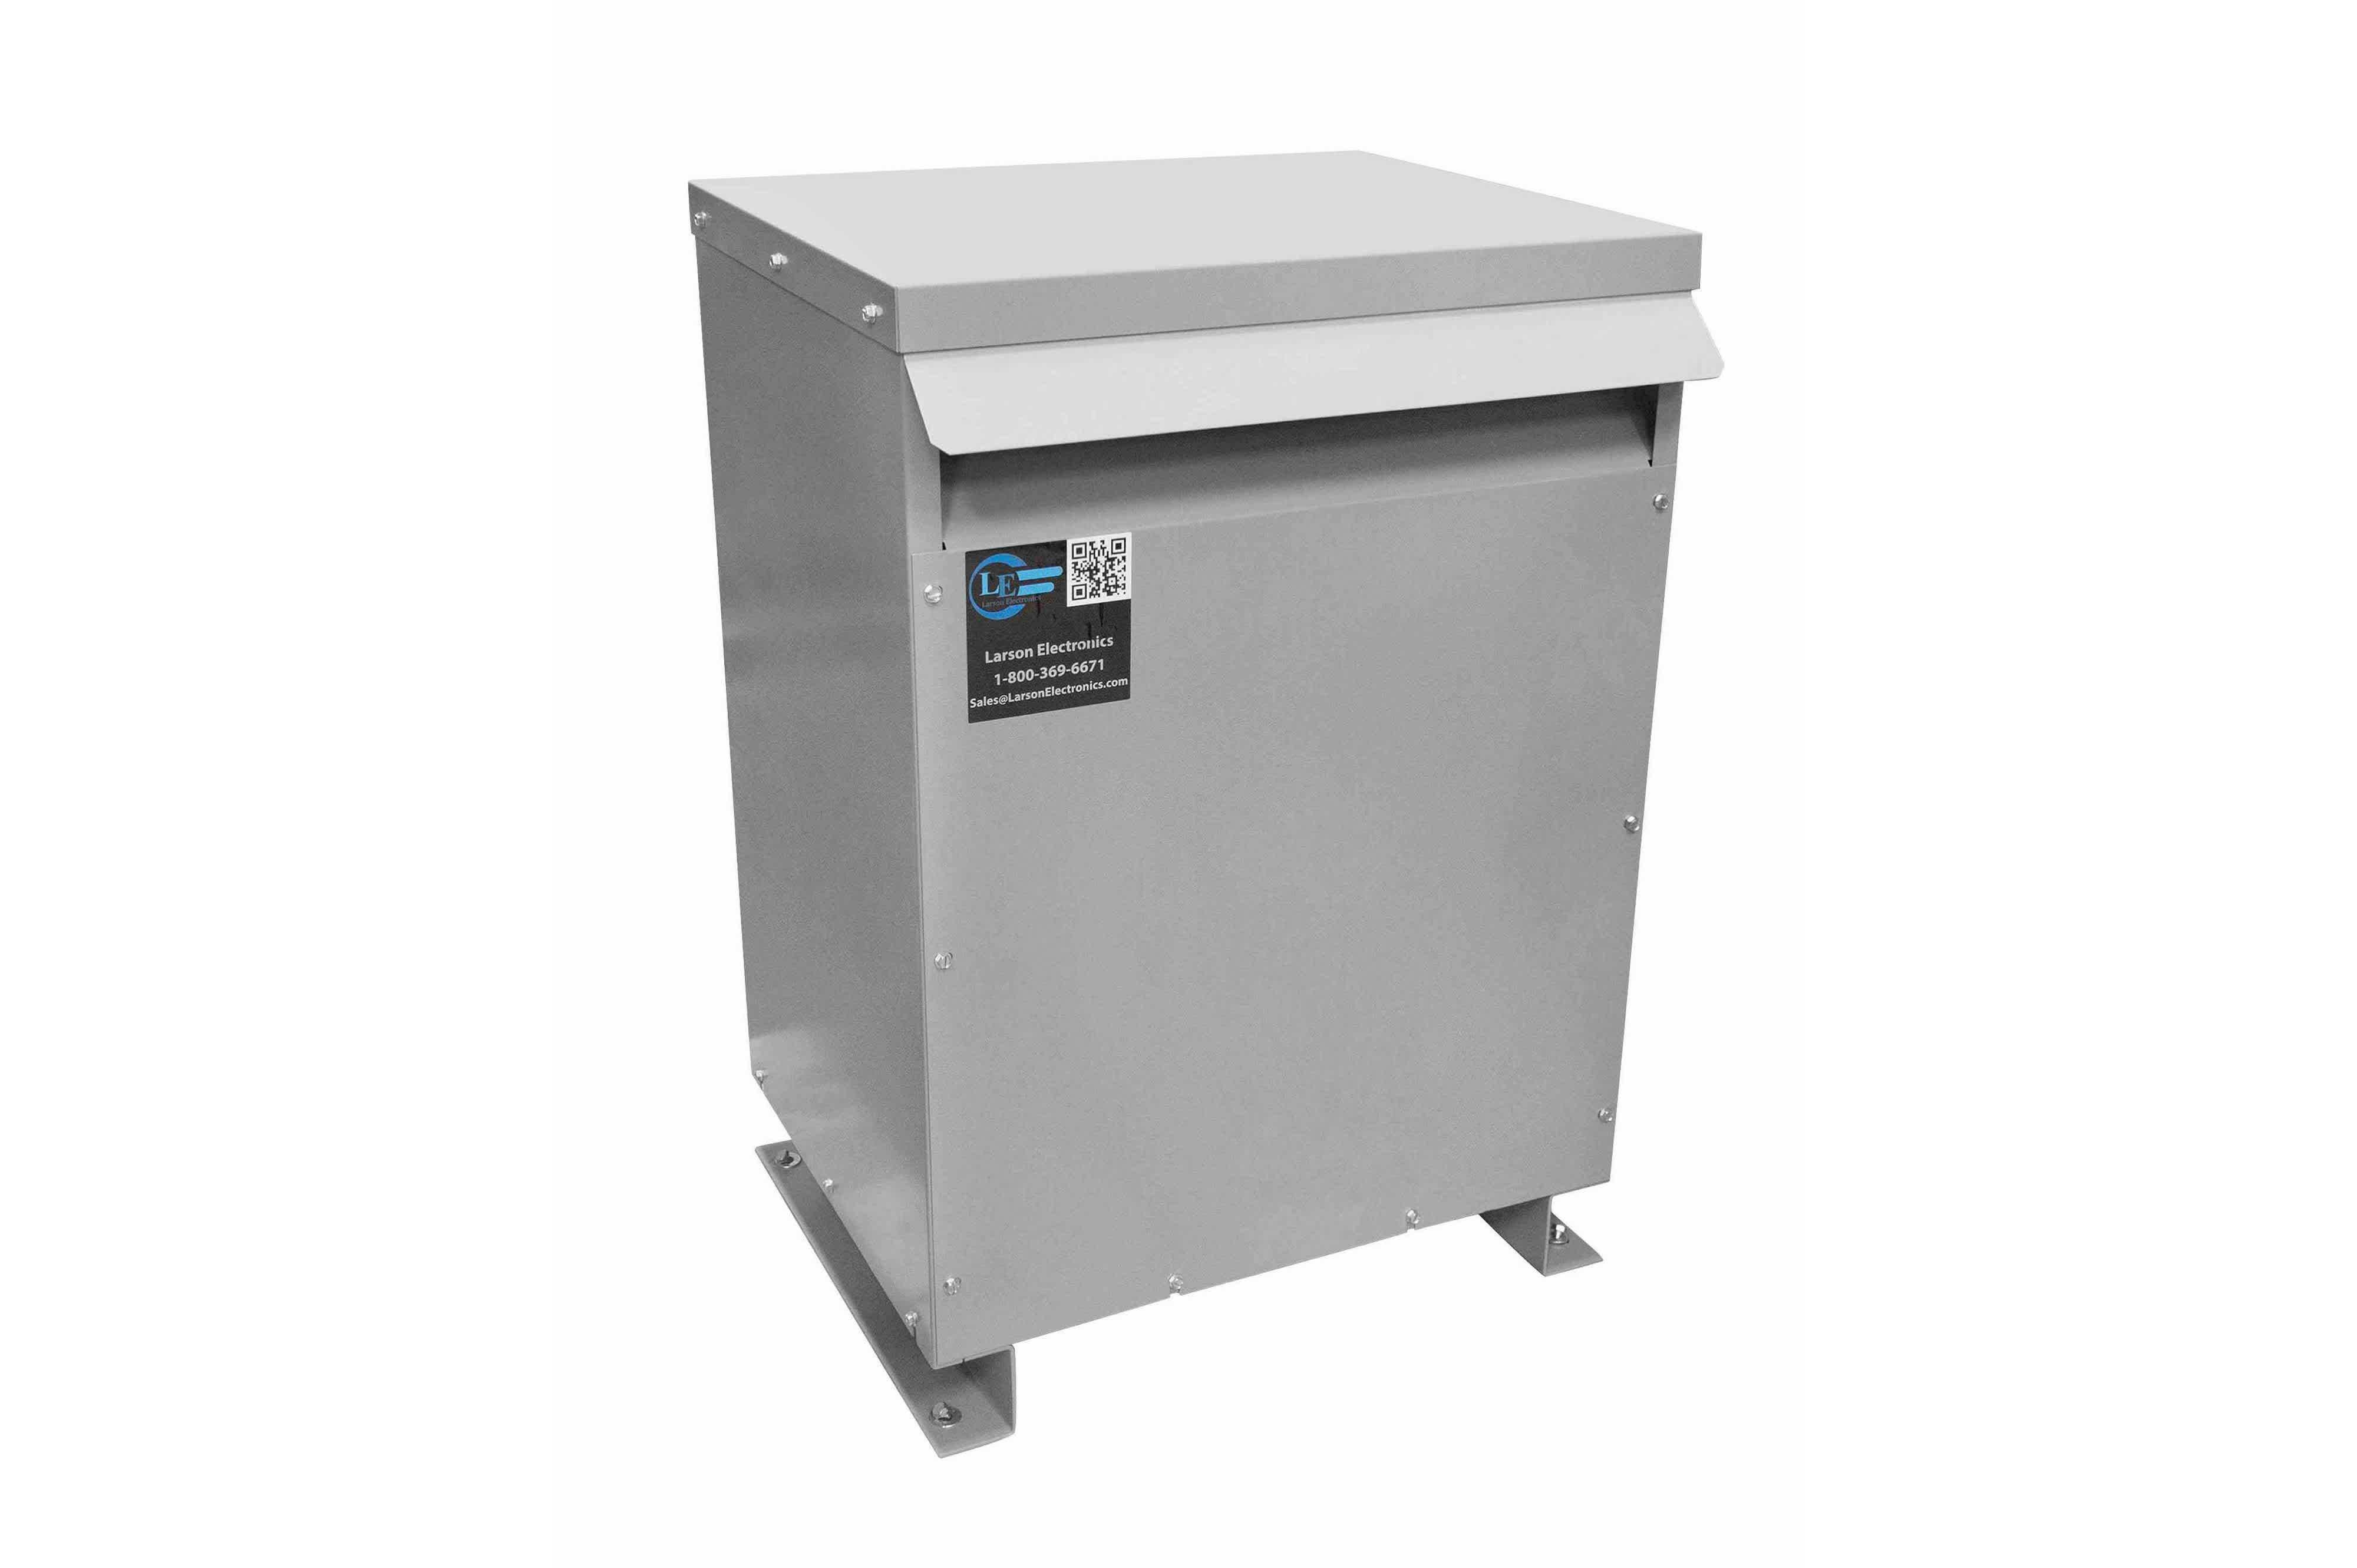 15 kVA 3PH Isolation Transformer, 480V Wye Primary, 600V Delta Secondary, N3R, Ventilated, 60 Hz